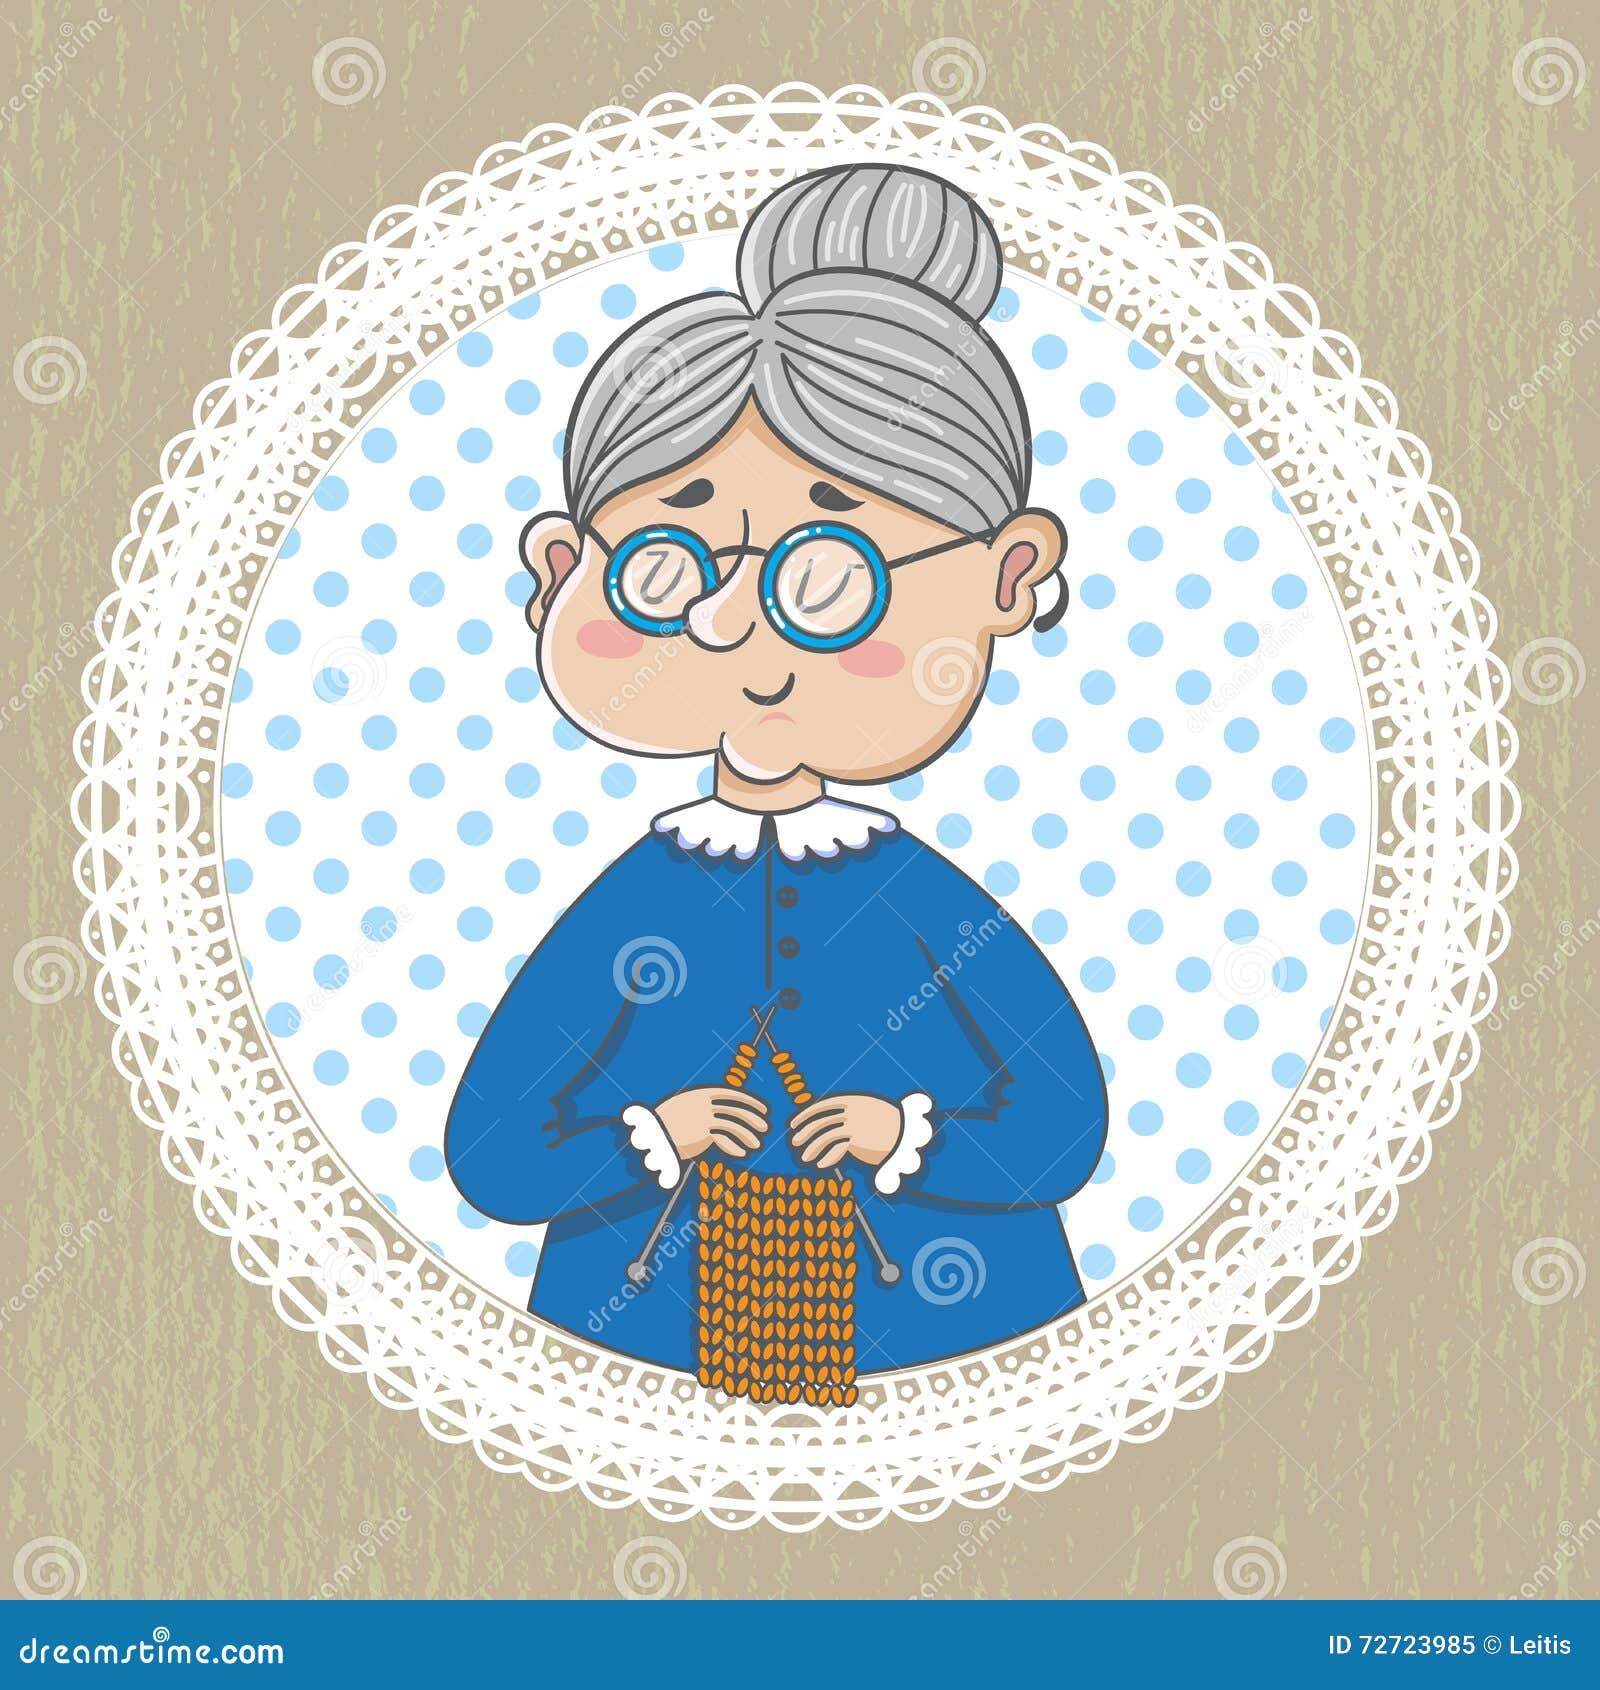 Grandma Knitting Clipart : Cute grandmother sitting in a chair knitti vector